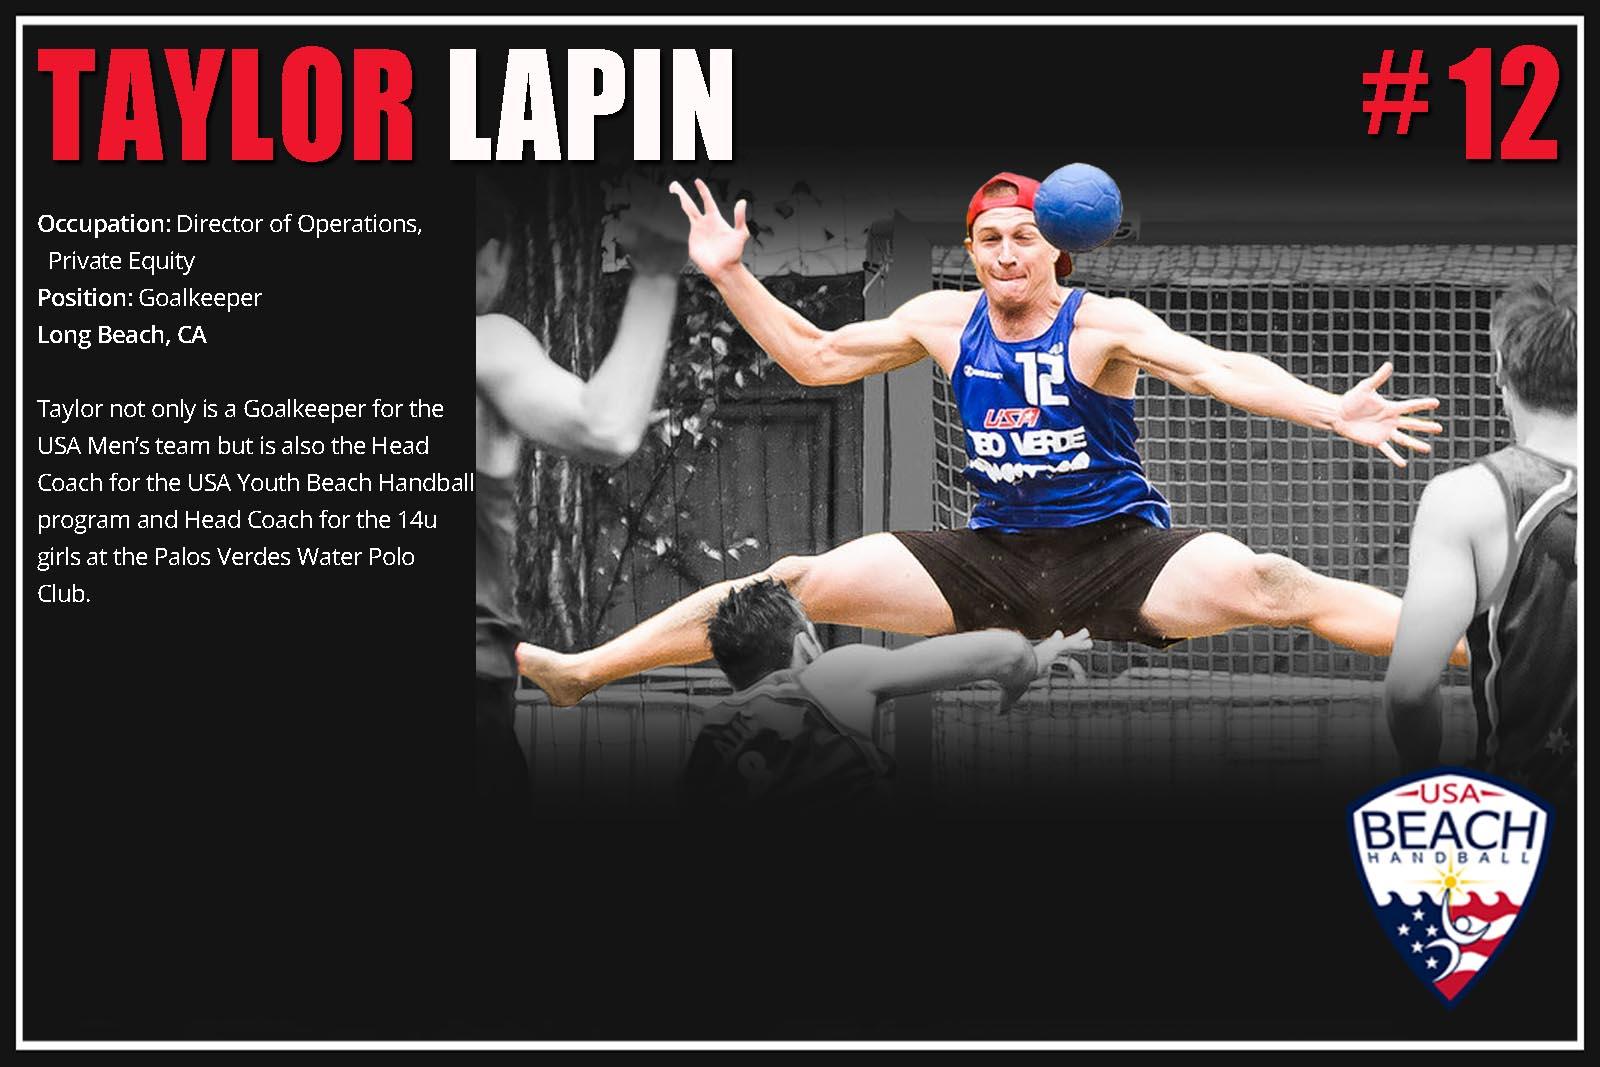 Taylor Lapin.jpg